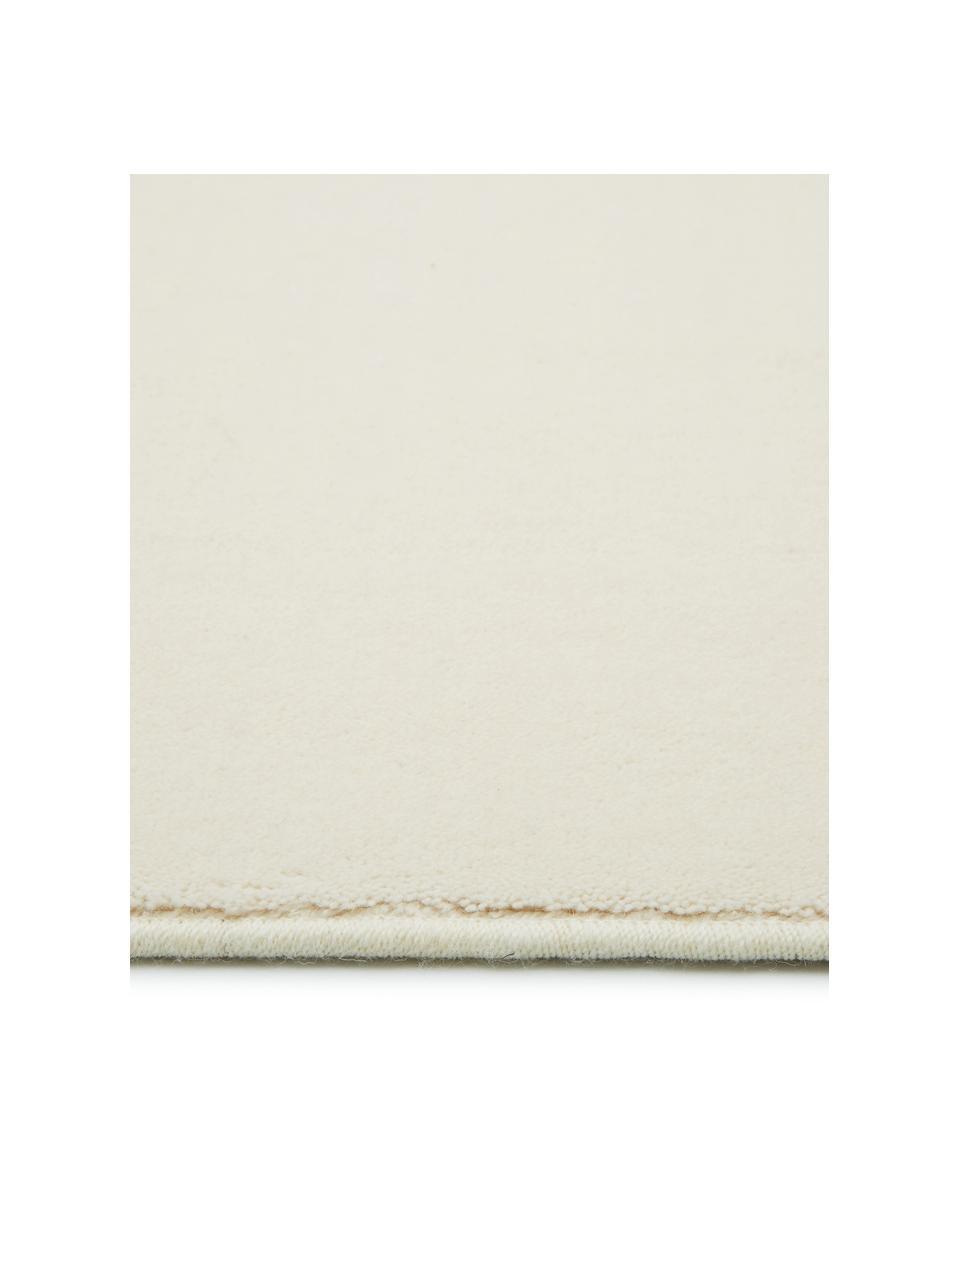 Tappeto in lana beige Ida, Retro: 60% juta, 40% poliestere , Beige, Larg. 200 x Lung. 300 cm  (taglia L)